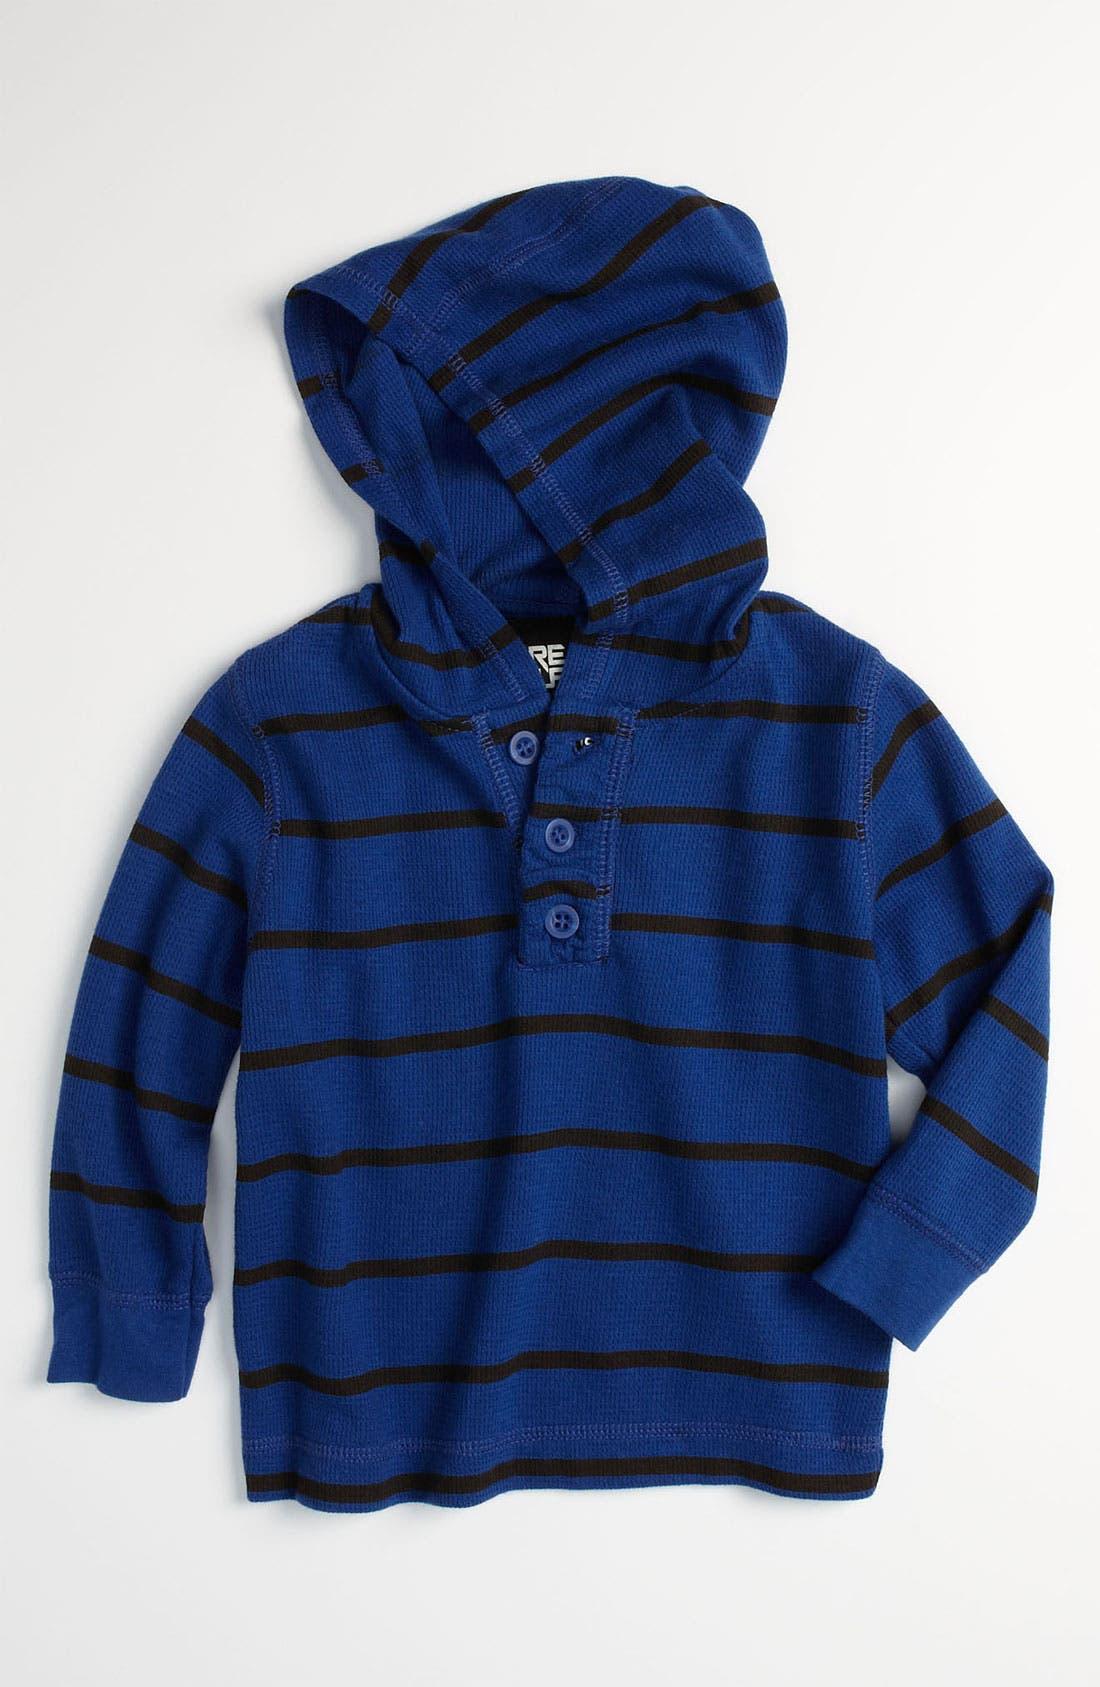 Main Image - Pure Stuff 'Tristen' Thermal Hoodie (Toddler)